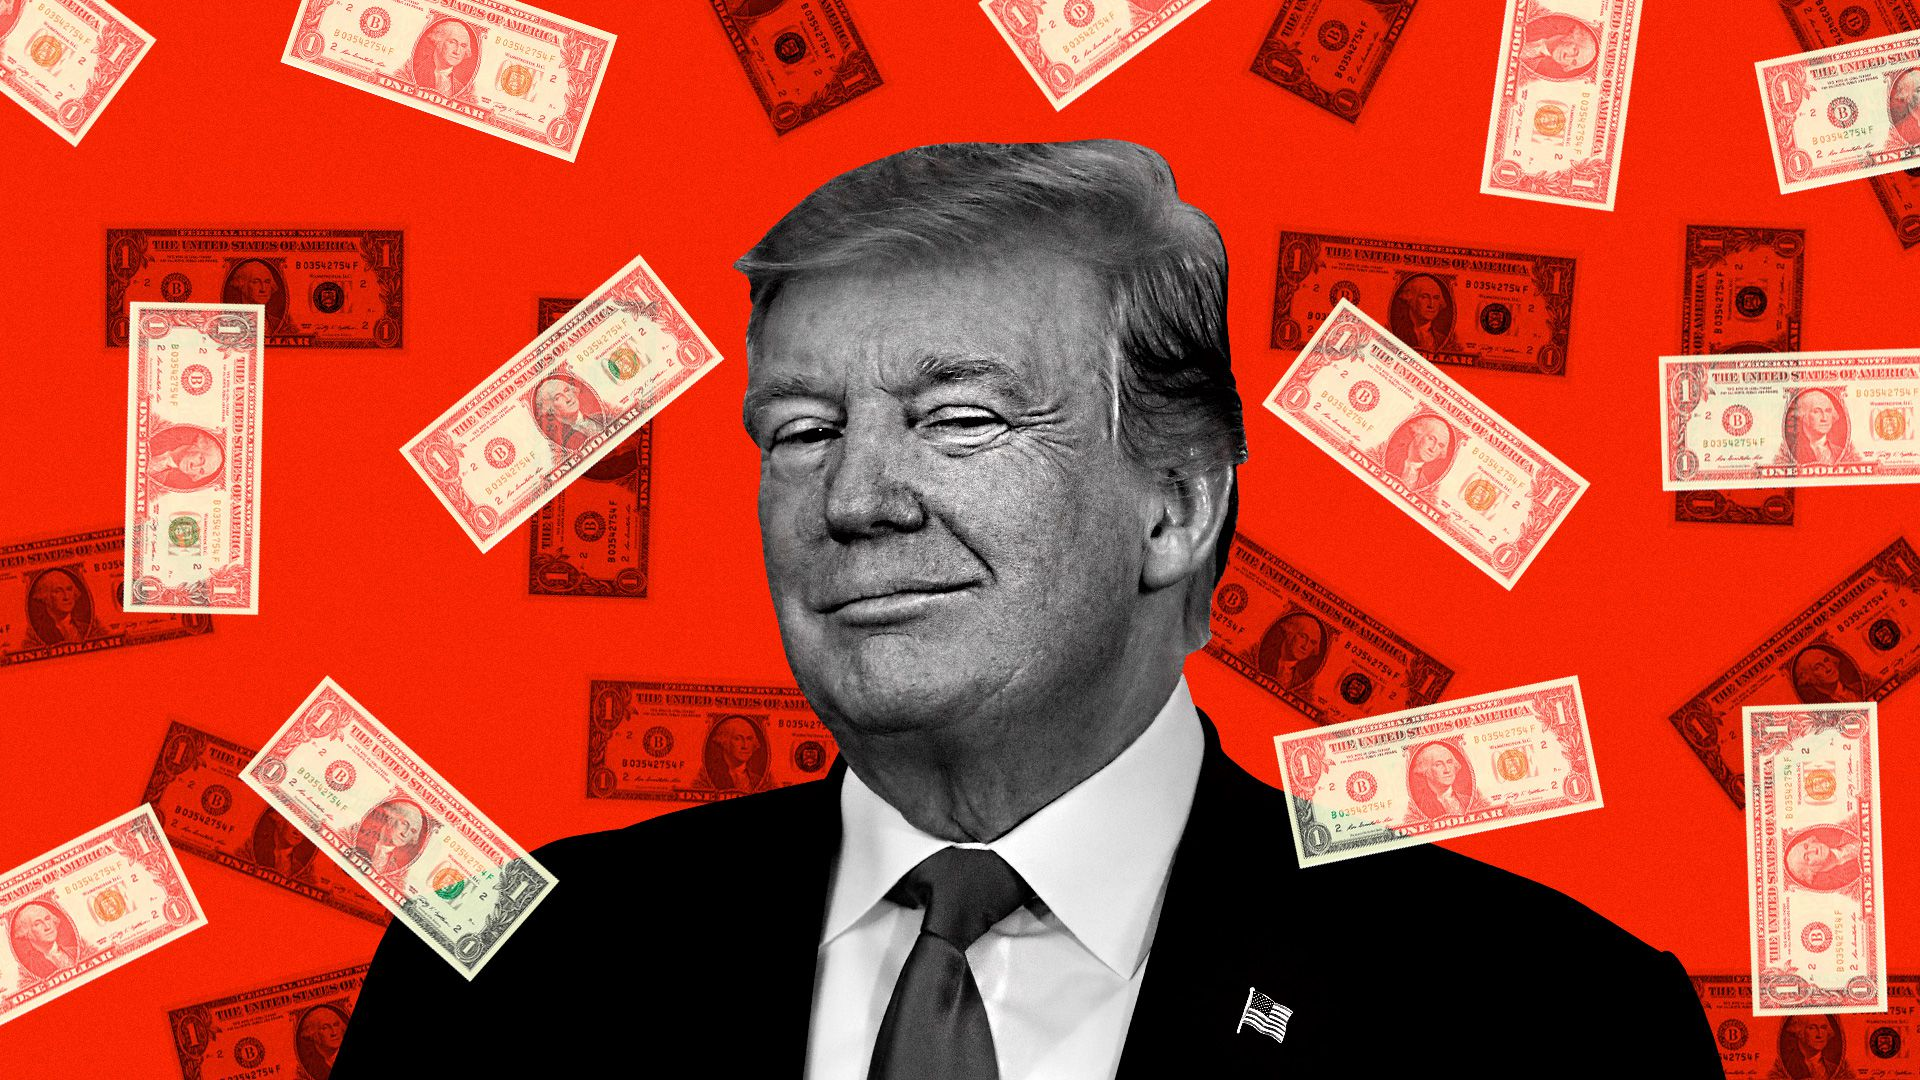 Trump smiling while dollar bills are raining all around him